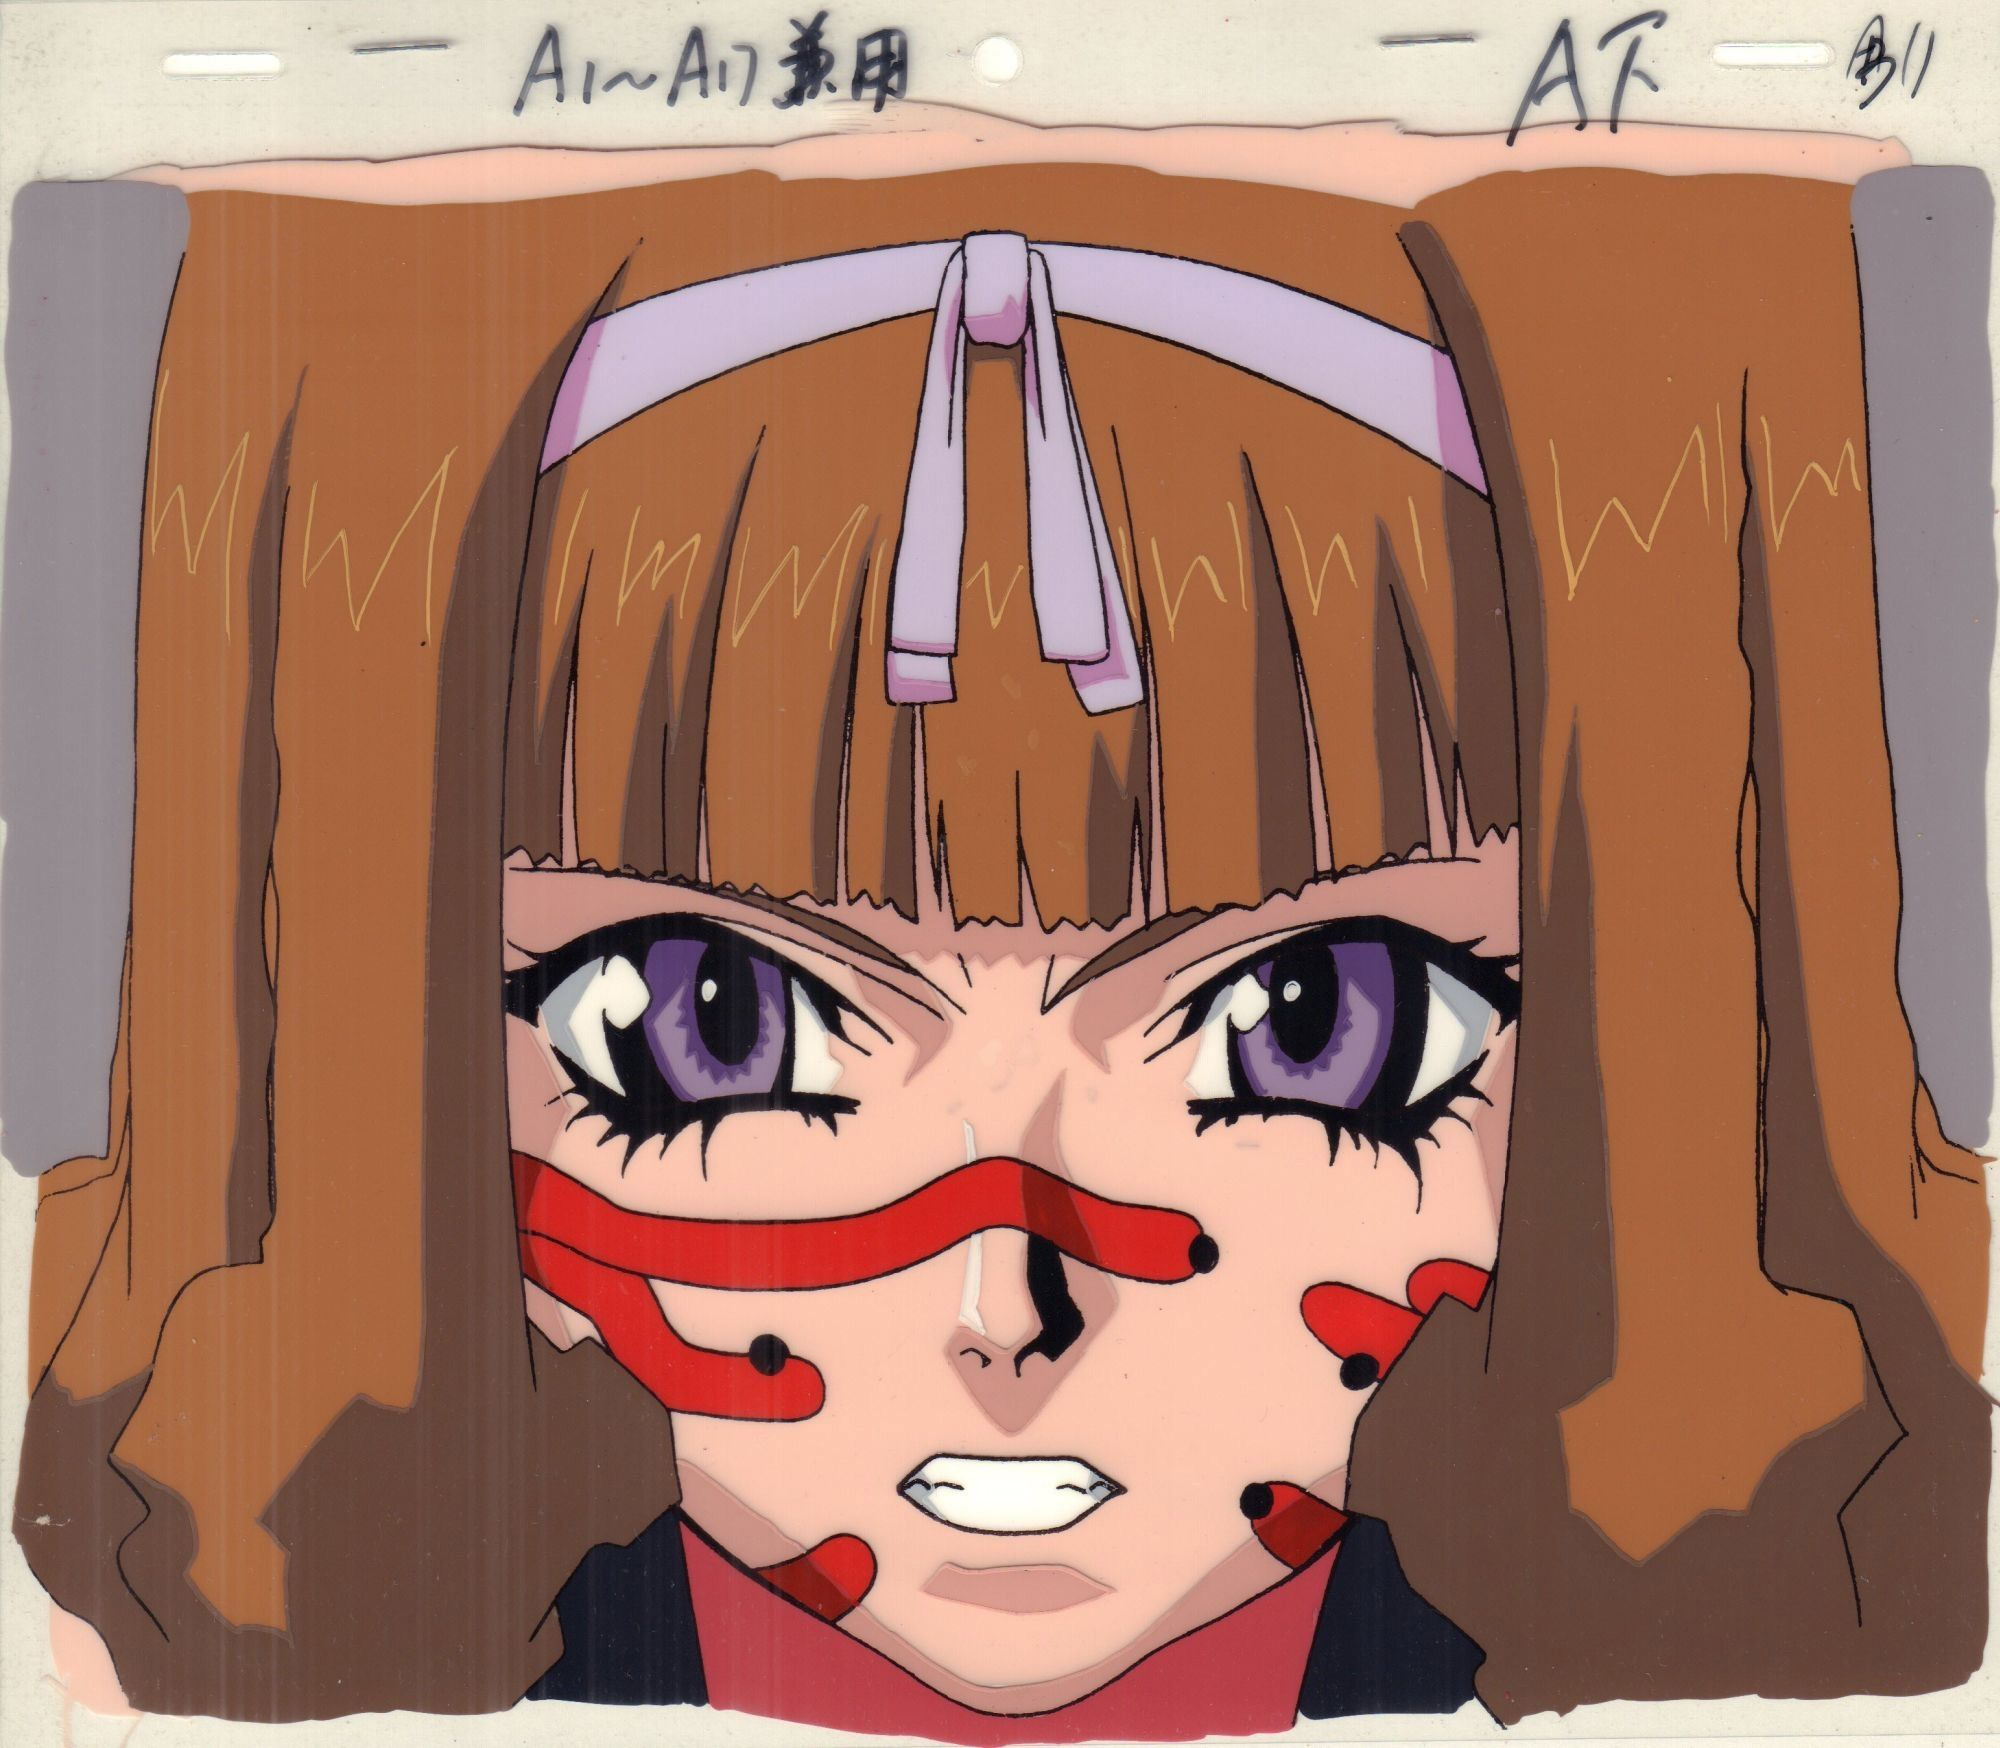 Ginsou Kikou Oodian, A-B 11